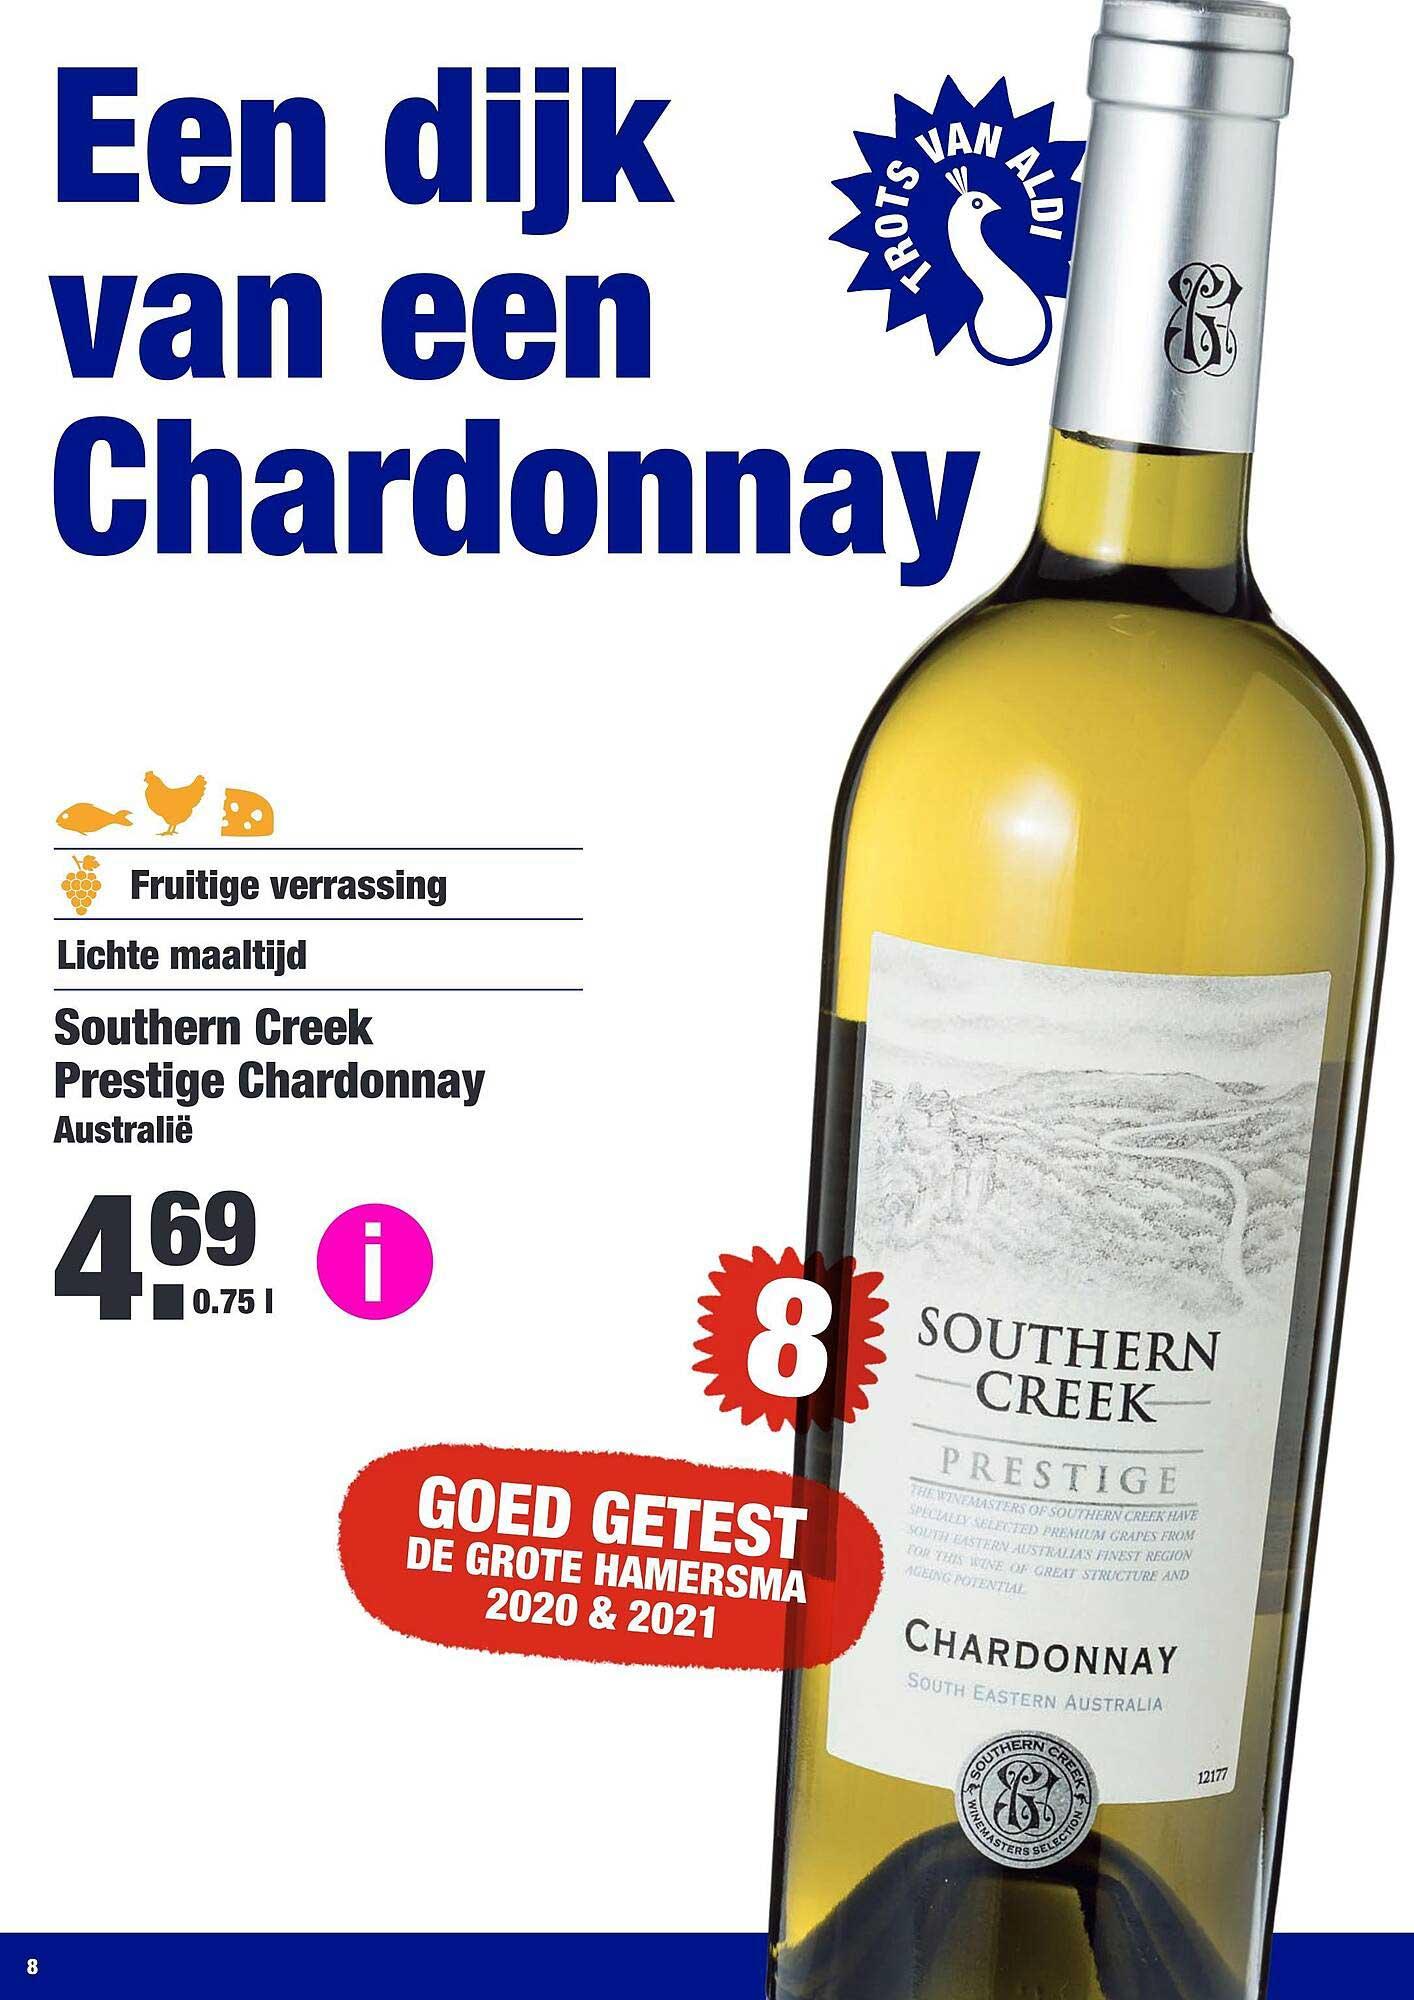 ALDI Southern Creek Prestige Chardonnay